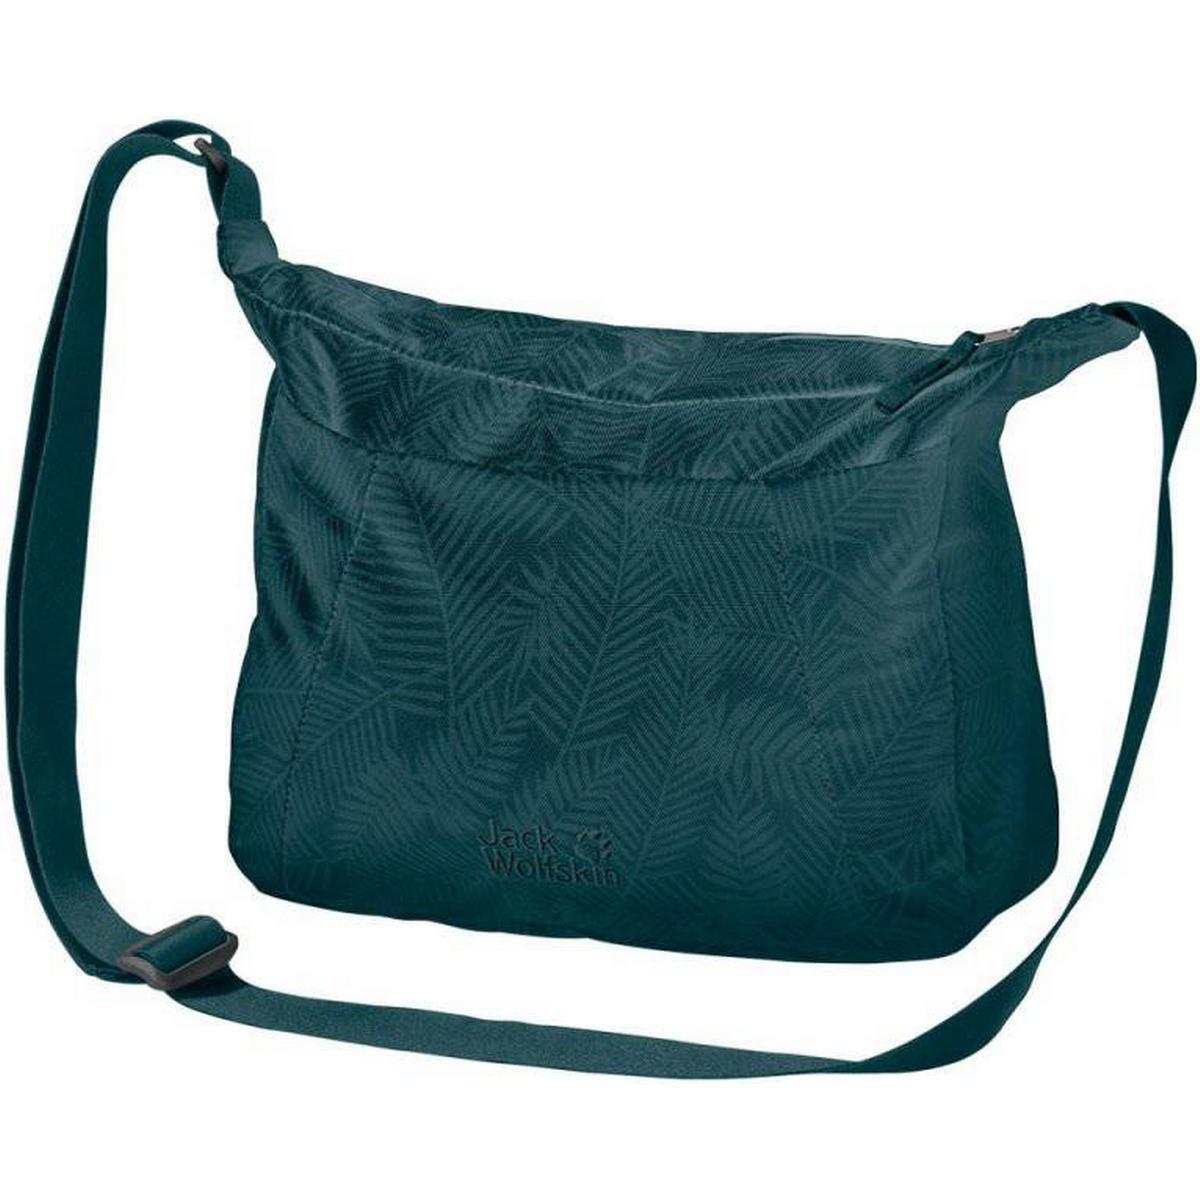 Jack Wolfskin Heathrow 2 Litres Small Travelling Shoulder Bag